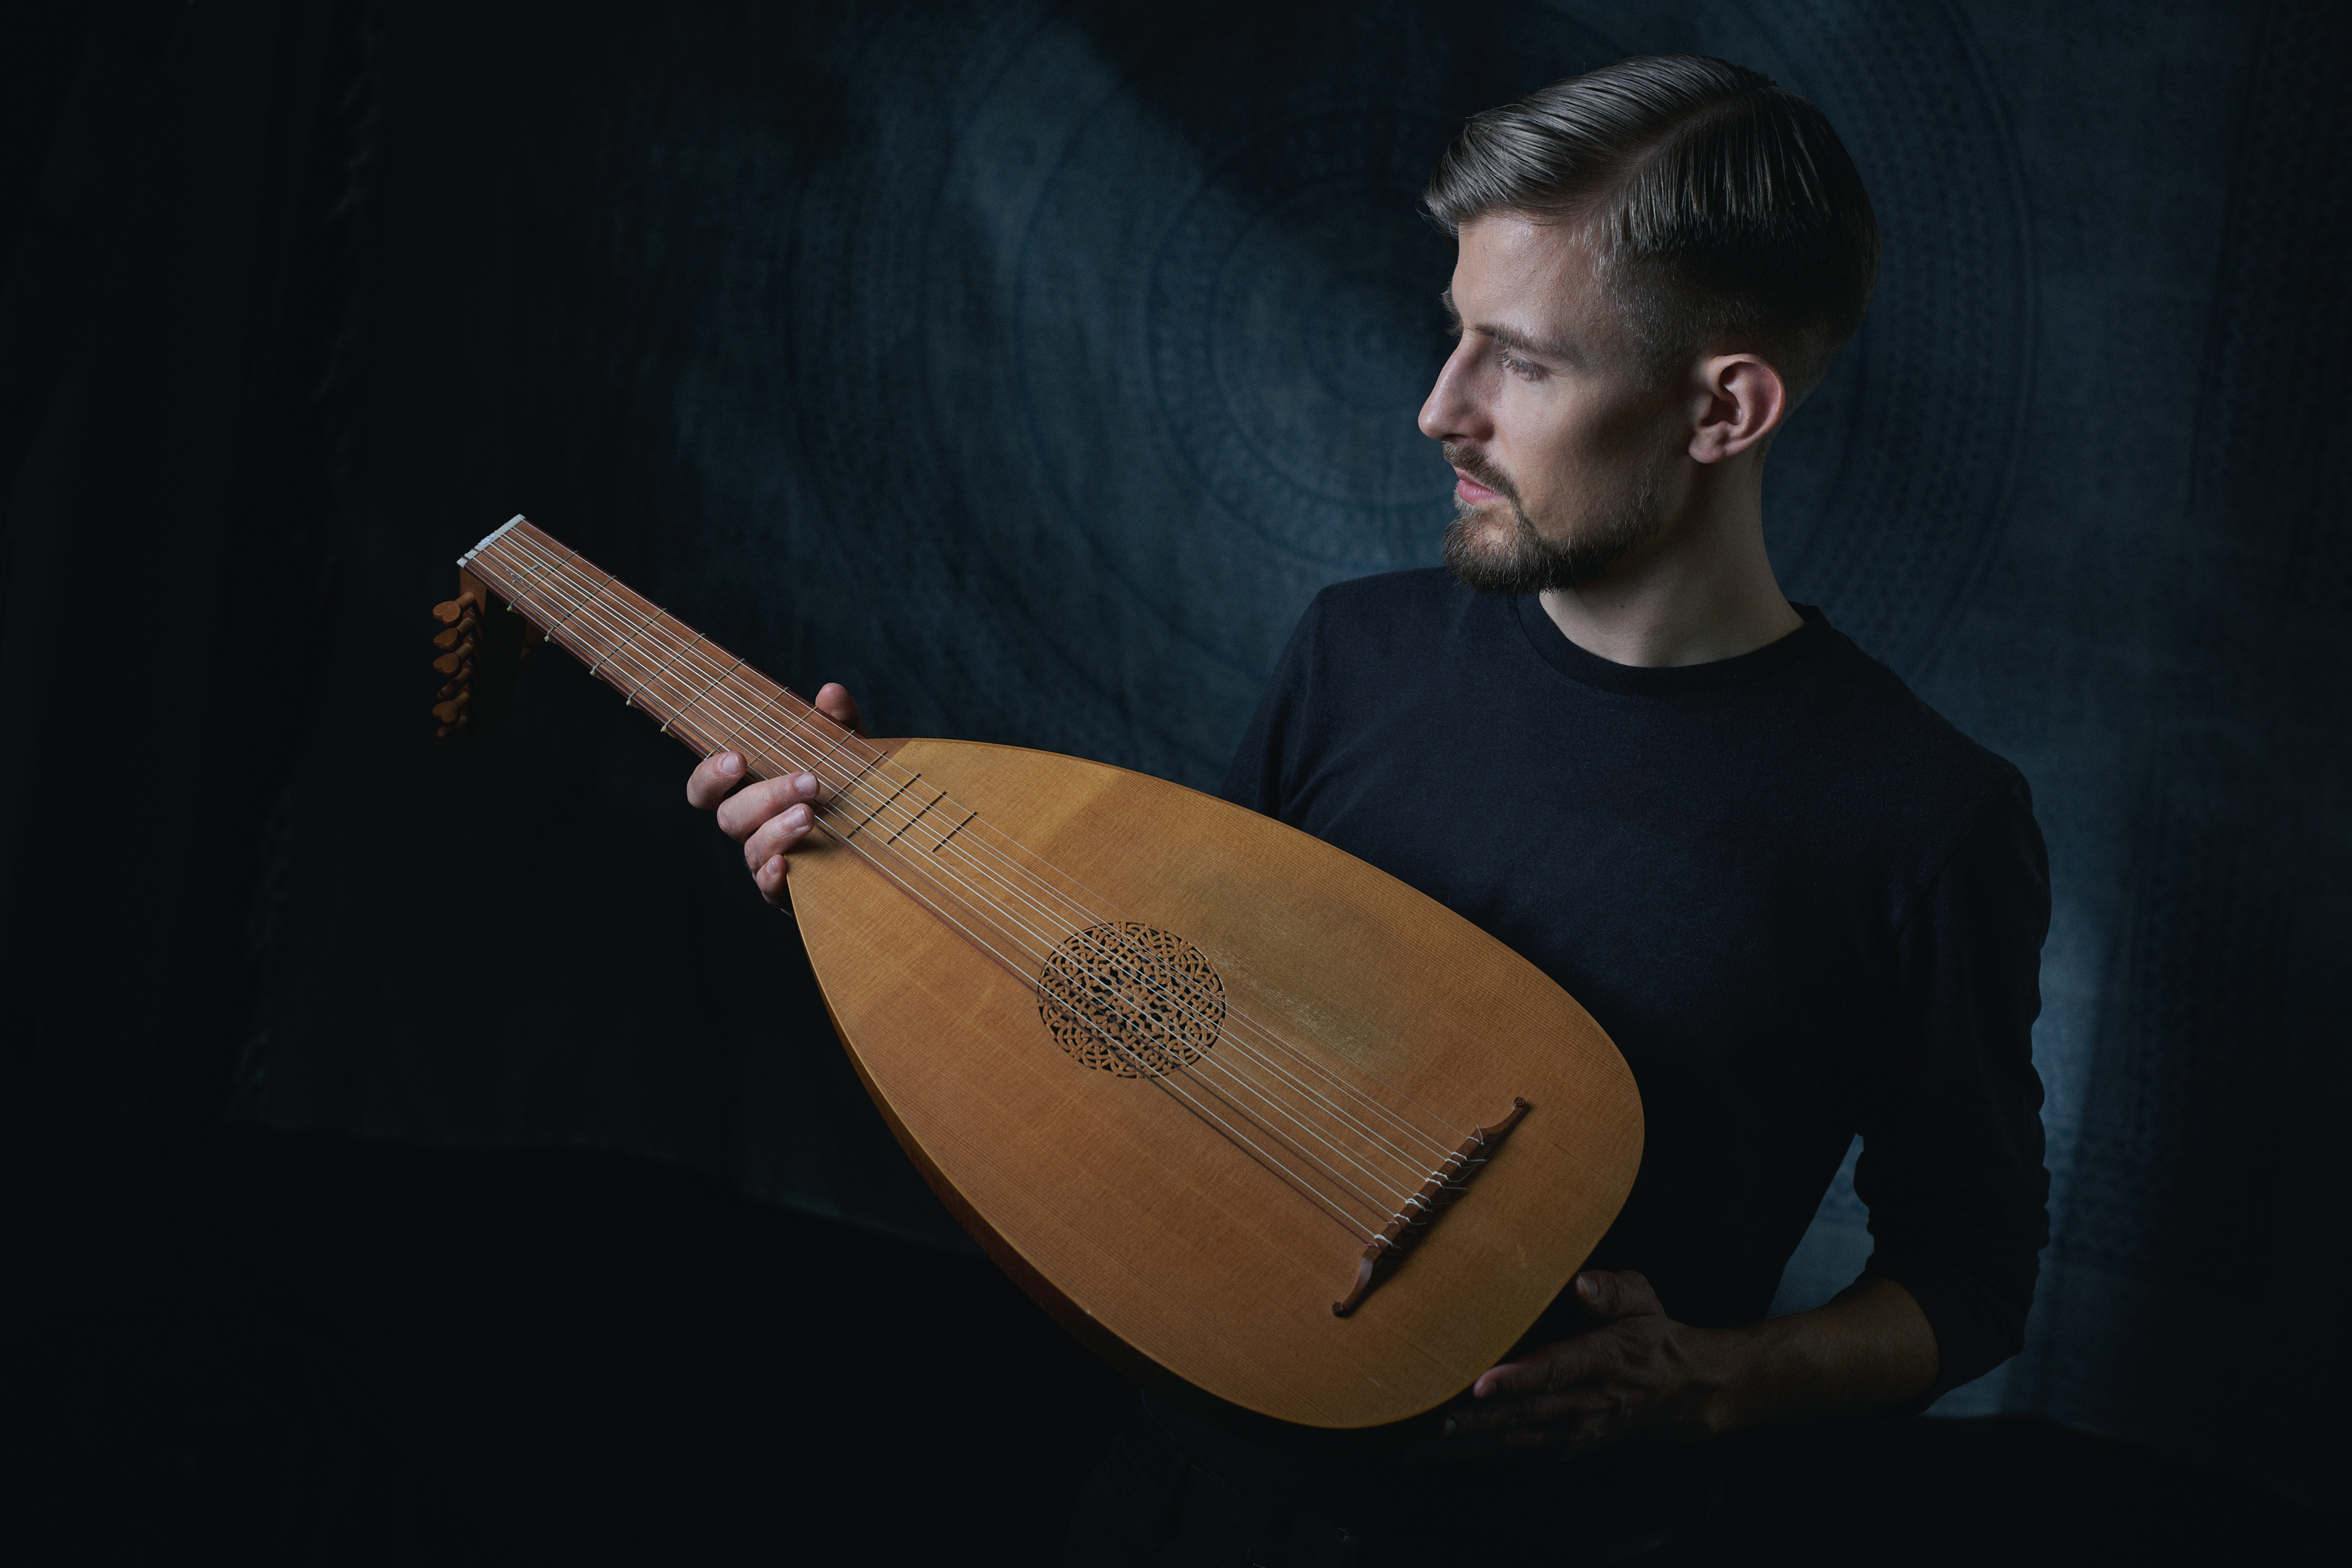 Jan Kiernicki